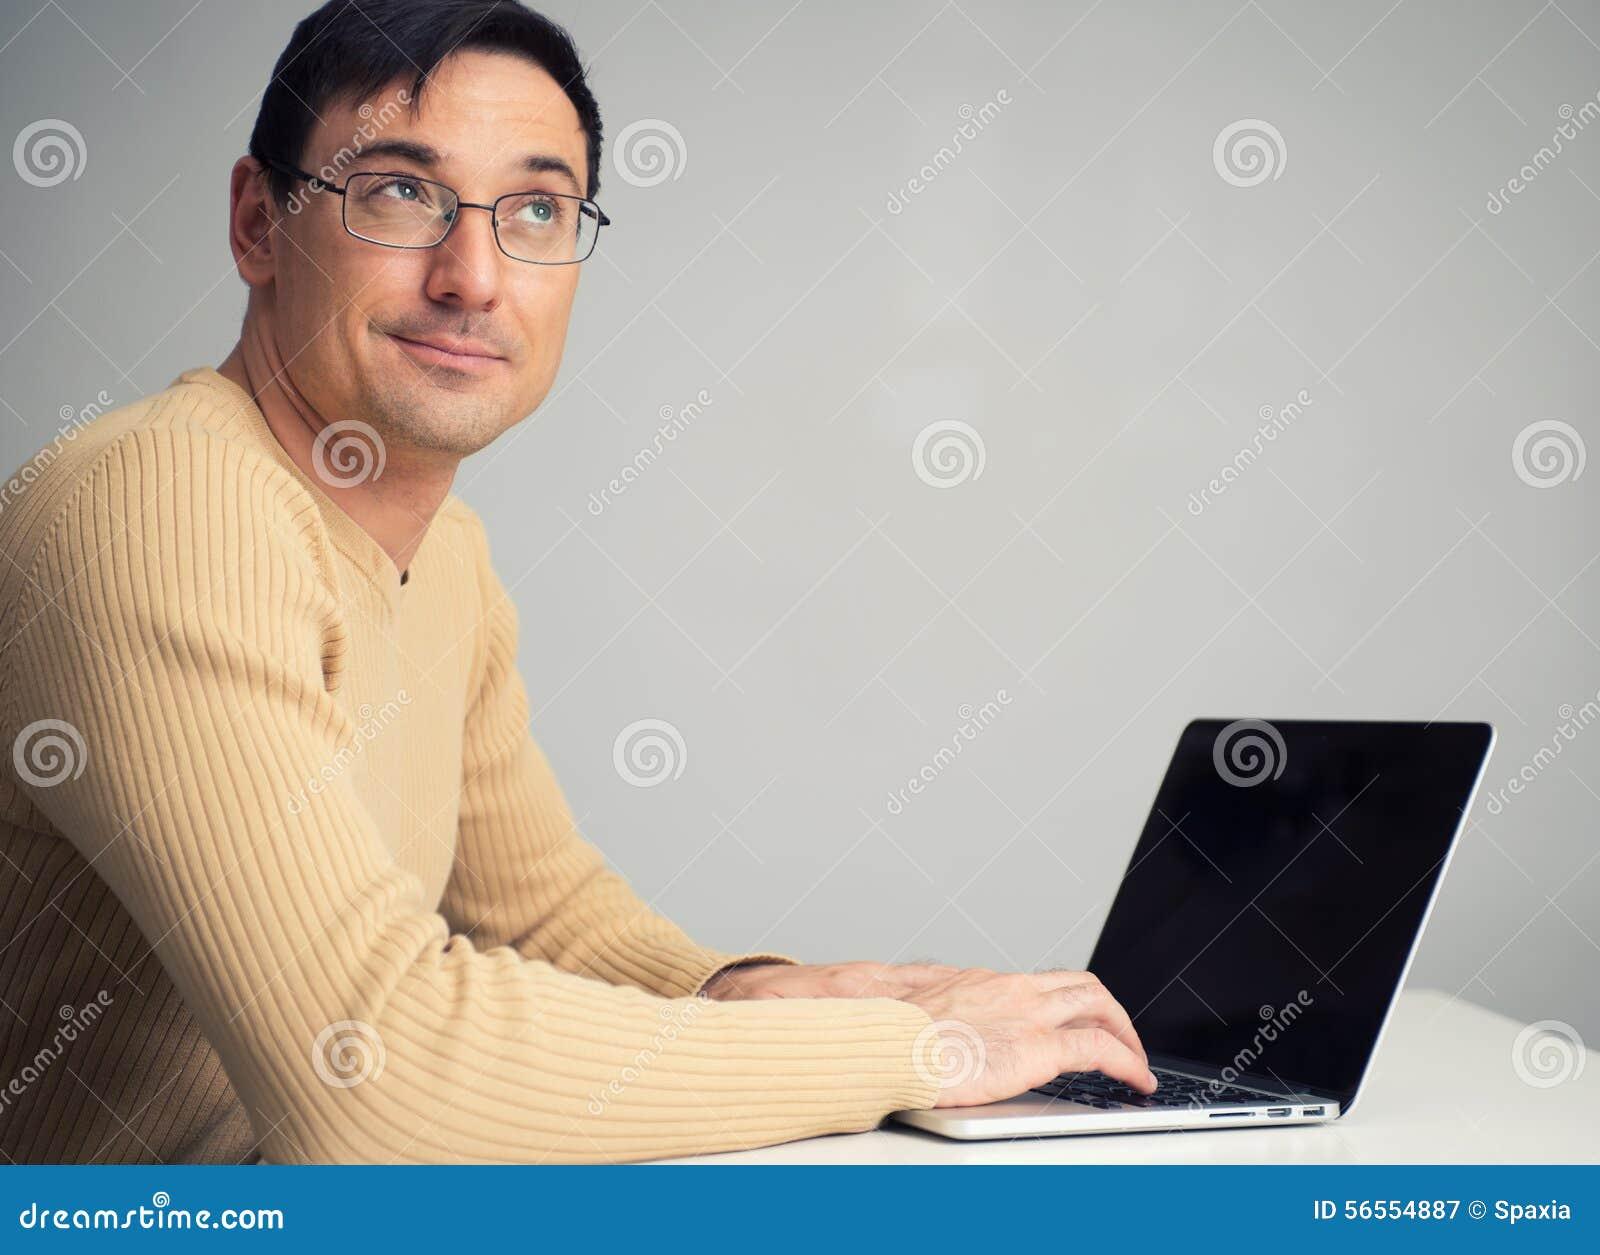 Download Συνεδρίαση ατόμων στο γραφείο, που λειτουργεί στο φορητό προσωπικό υπολογιστή Στοκ Εικόνα - εικόνα από άτομο, καθίστε: 56554887